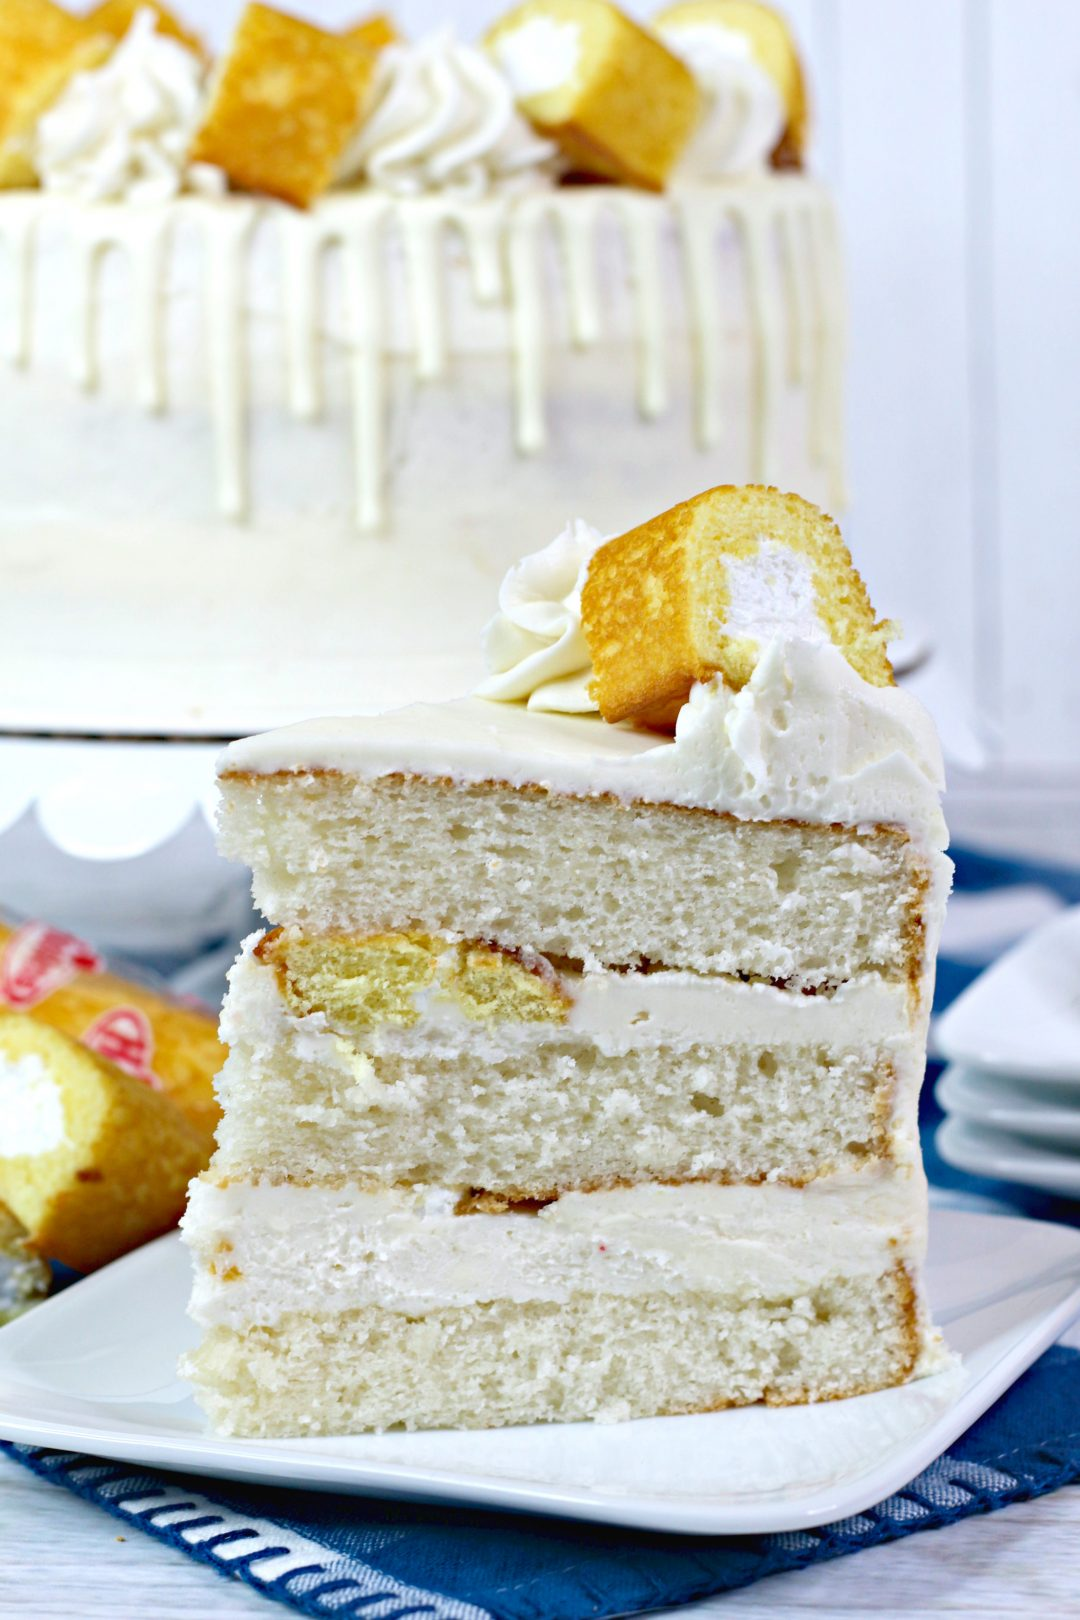 Layered Twinkie cake, twinkie dessert